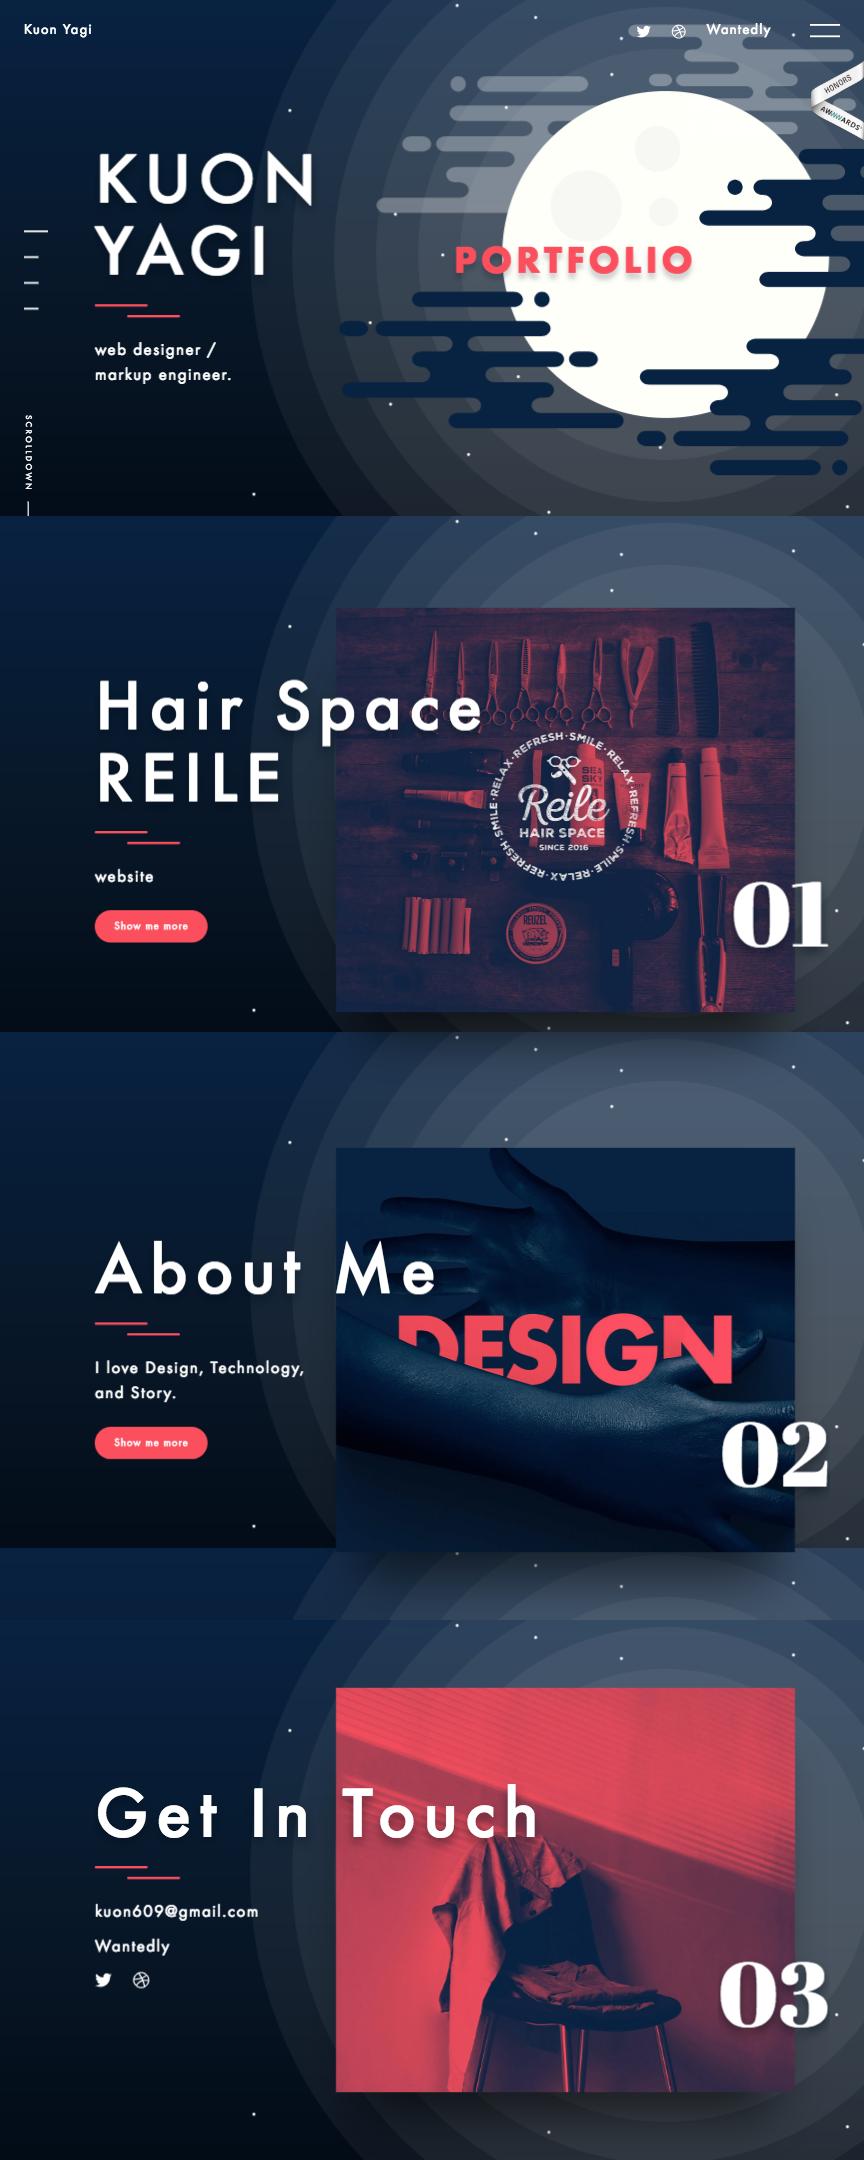 #webdesign #design #userinterface